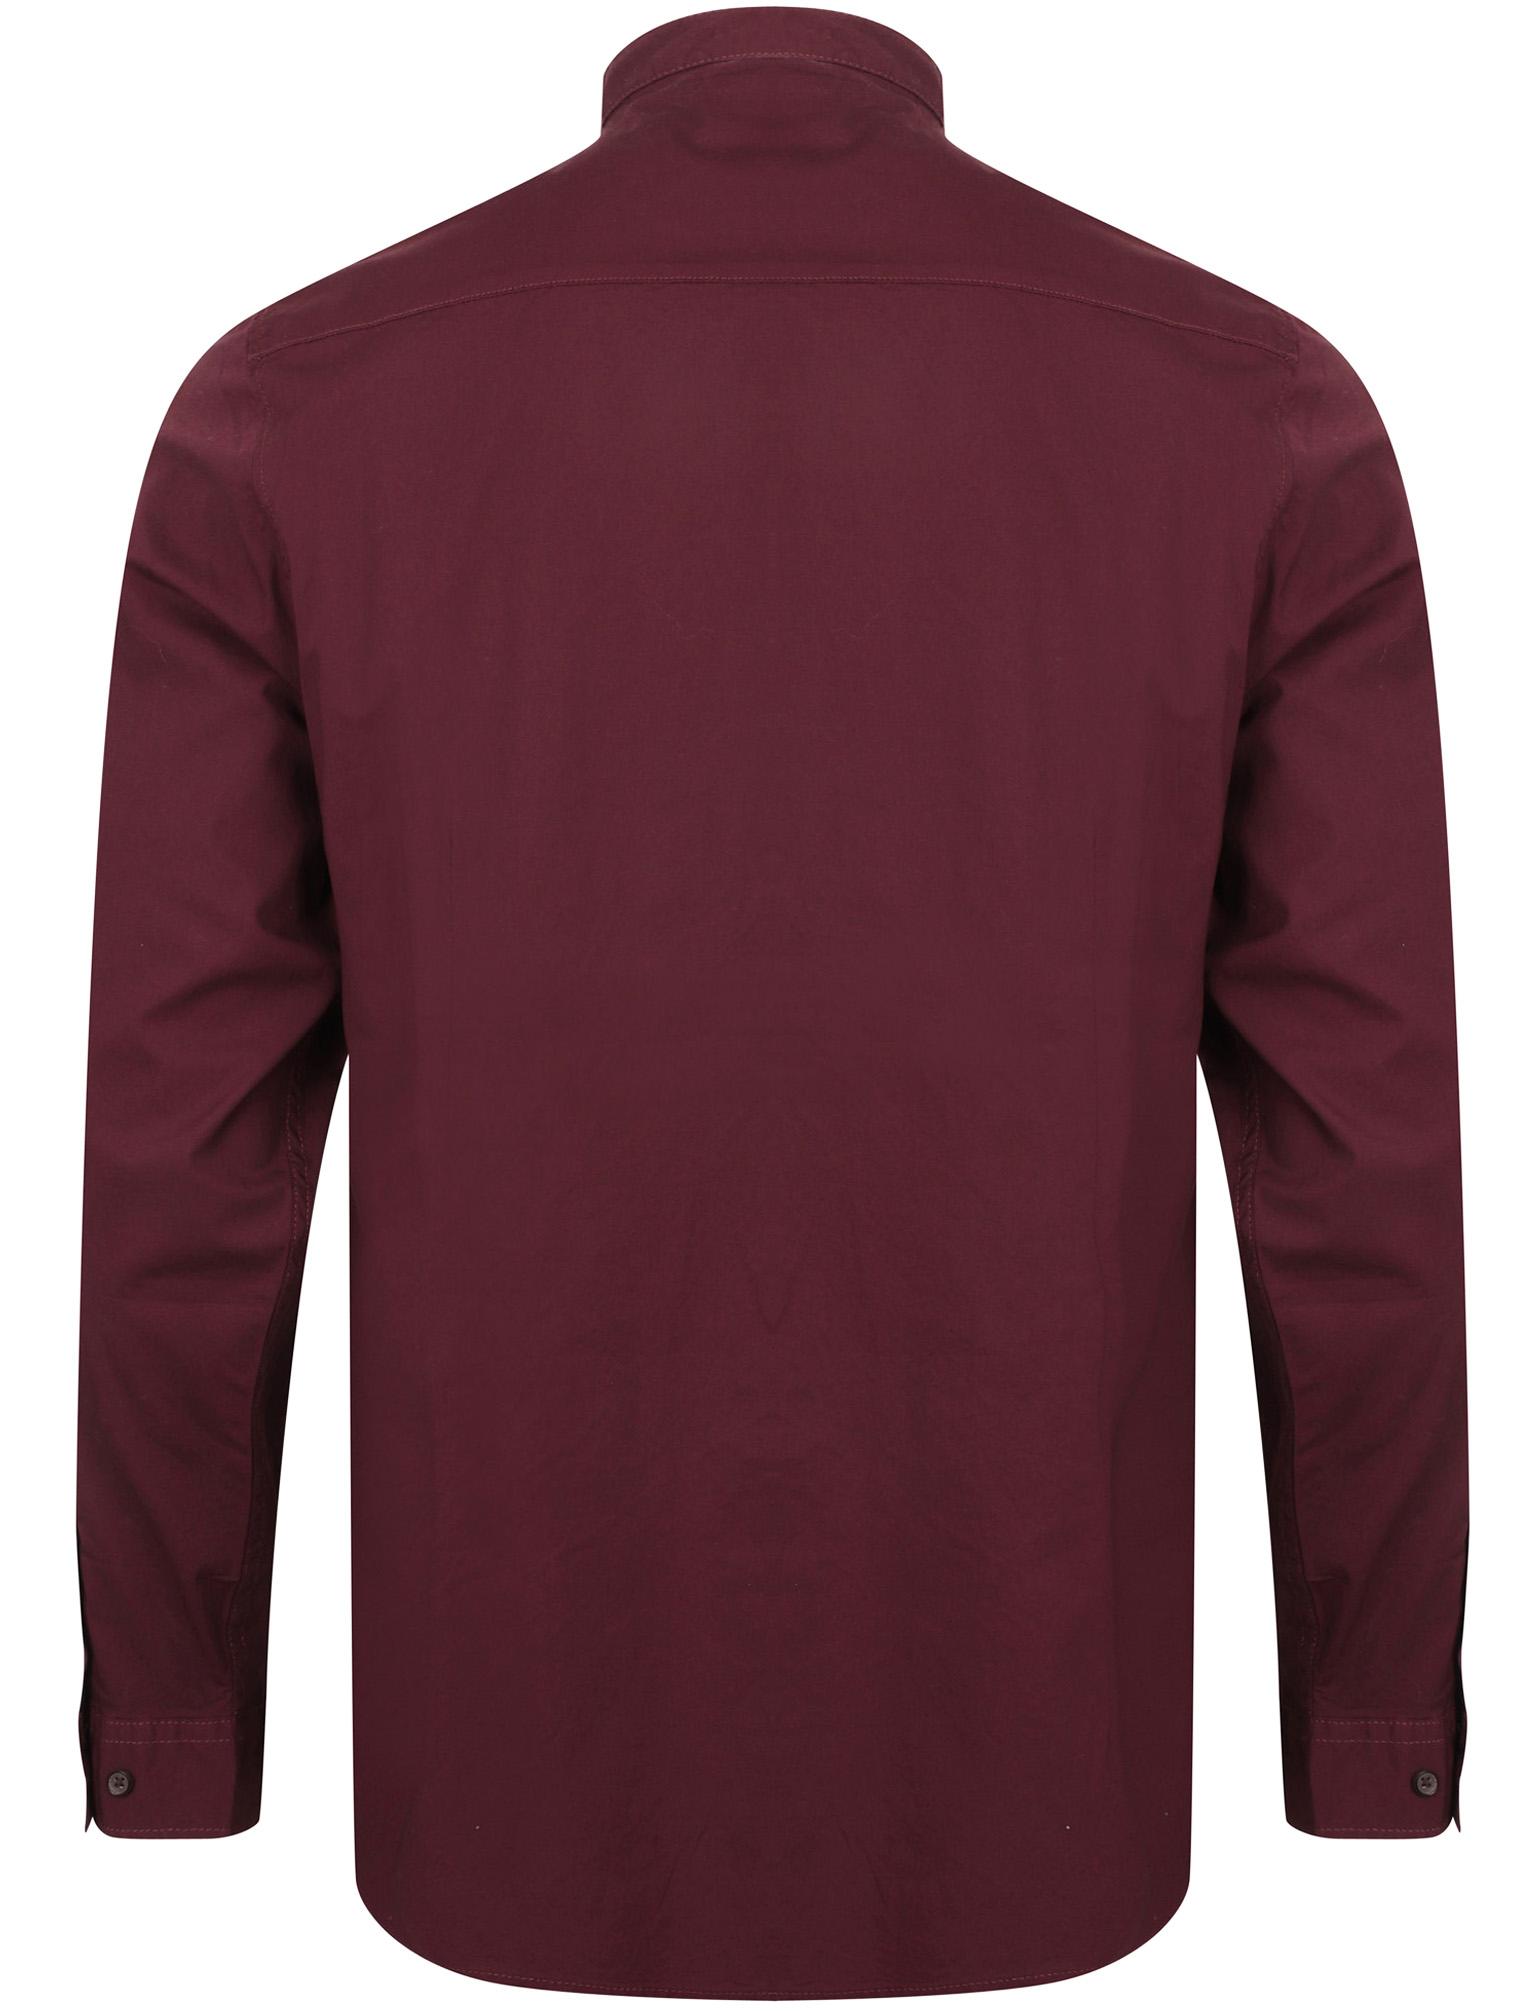 New Mens Tokyo Laundry Kampala Collar Button Down Long Sleeve Shirt Size S XL